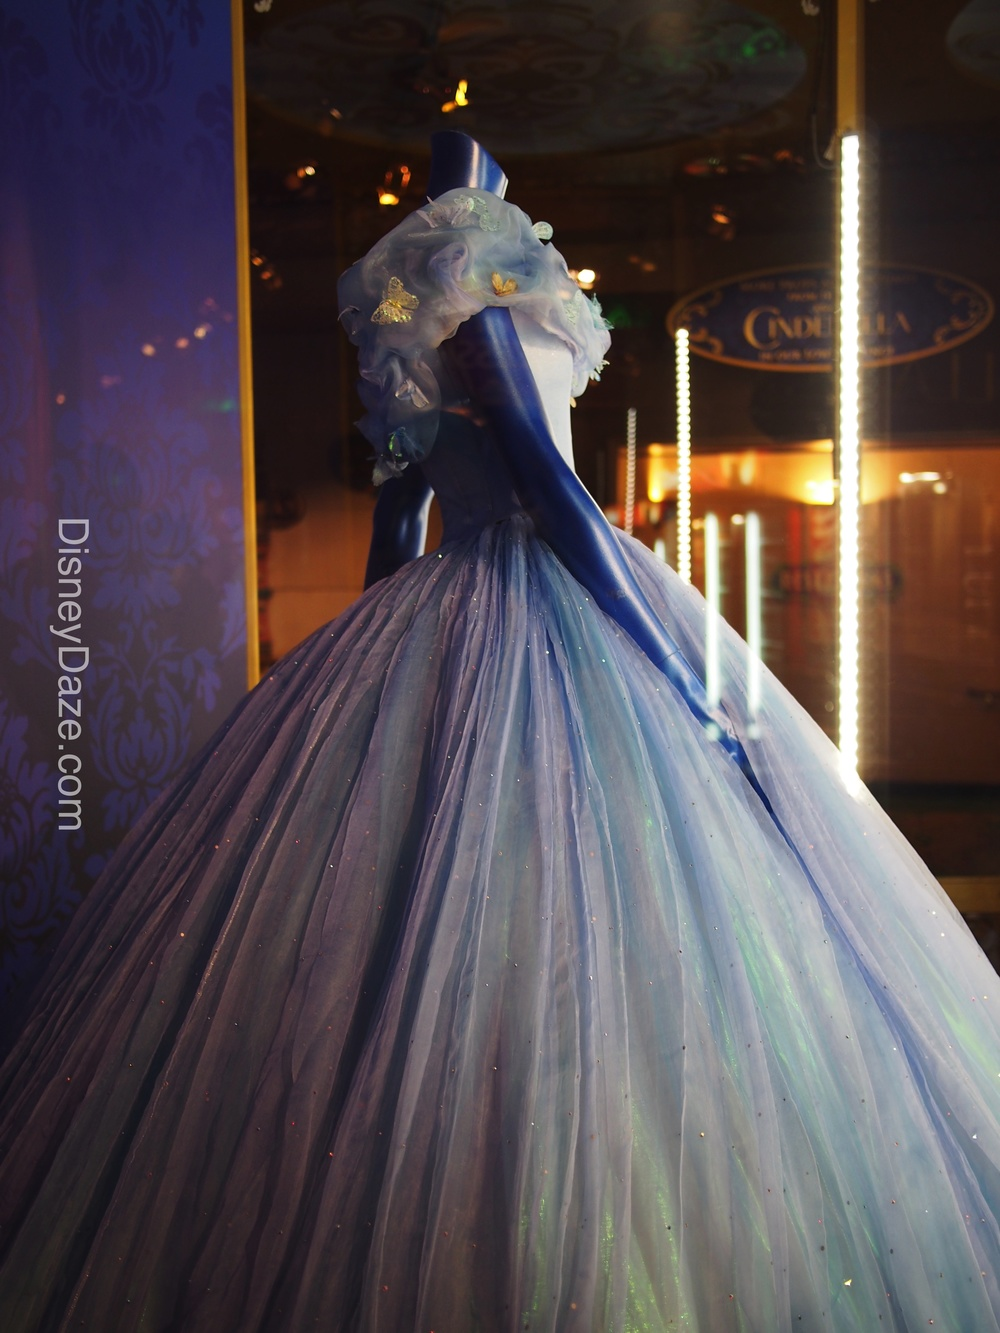 Cinderella19.jpg